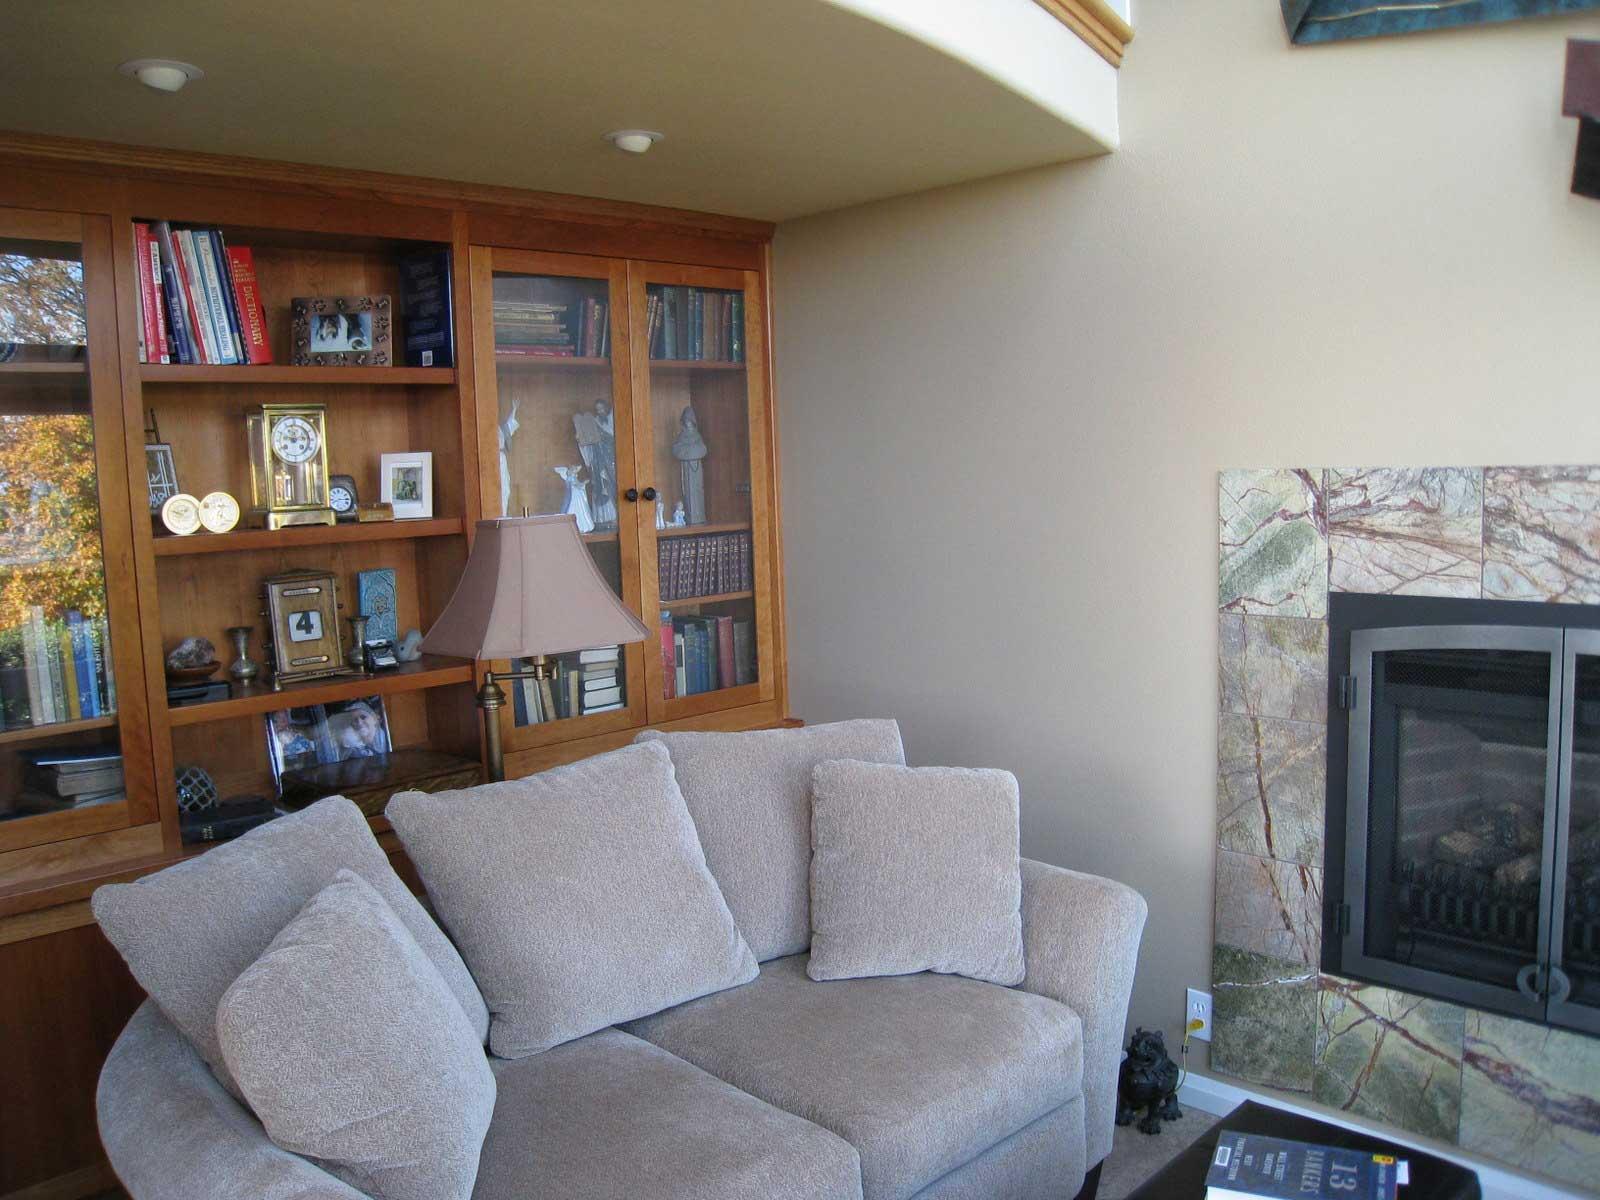 Corvallis Interior Remodeling